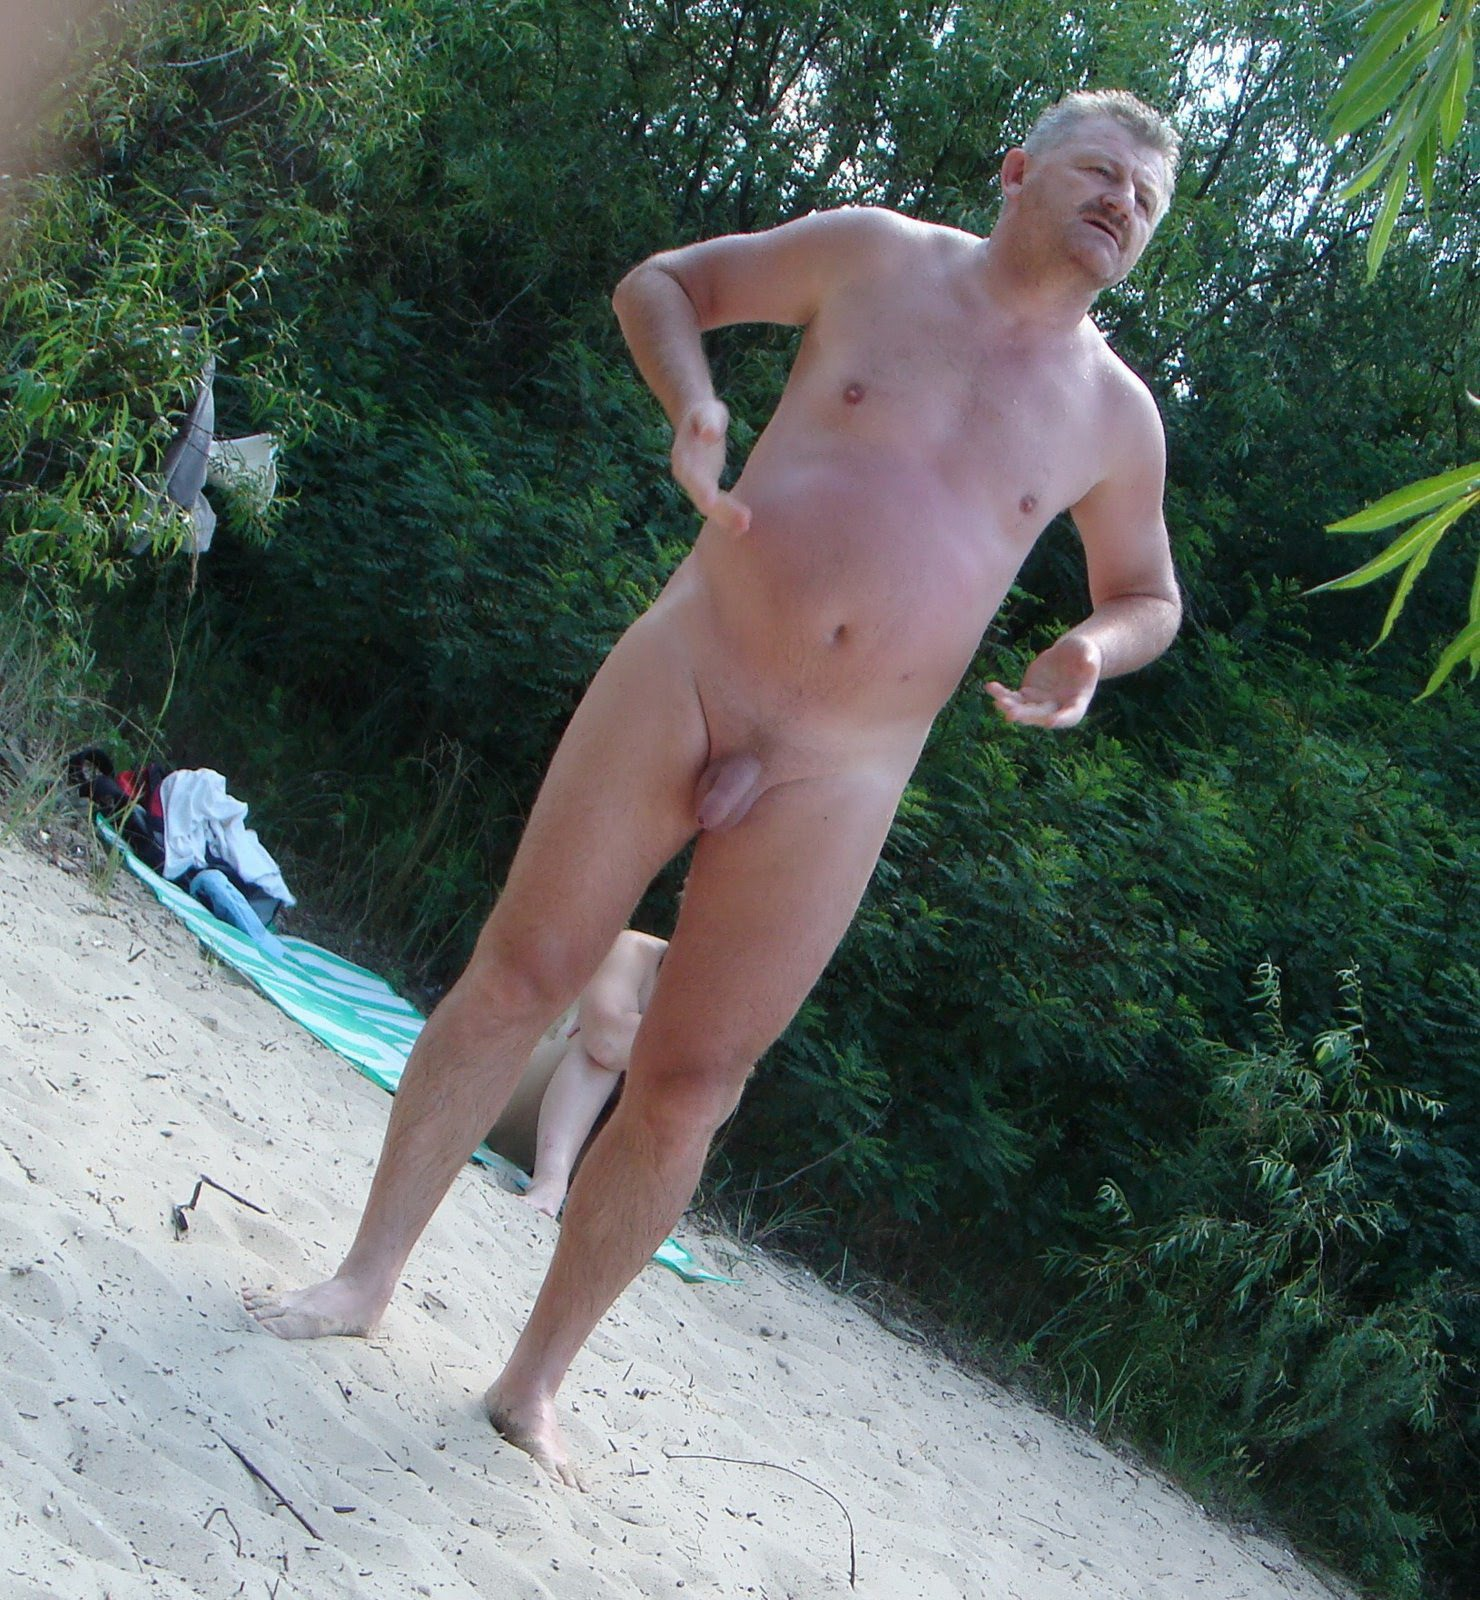 Russian nude lads, jennifer carpenter fakes